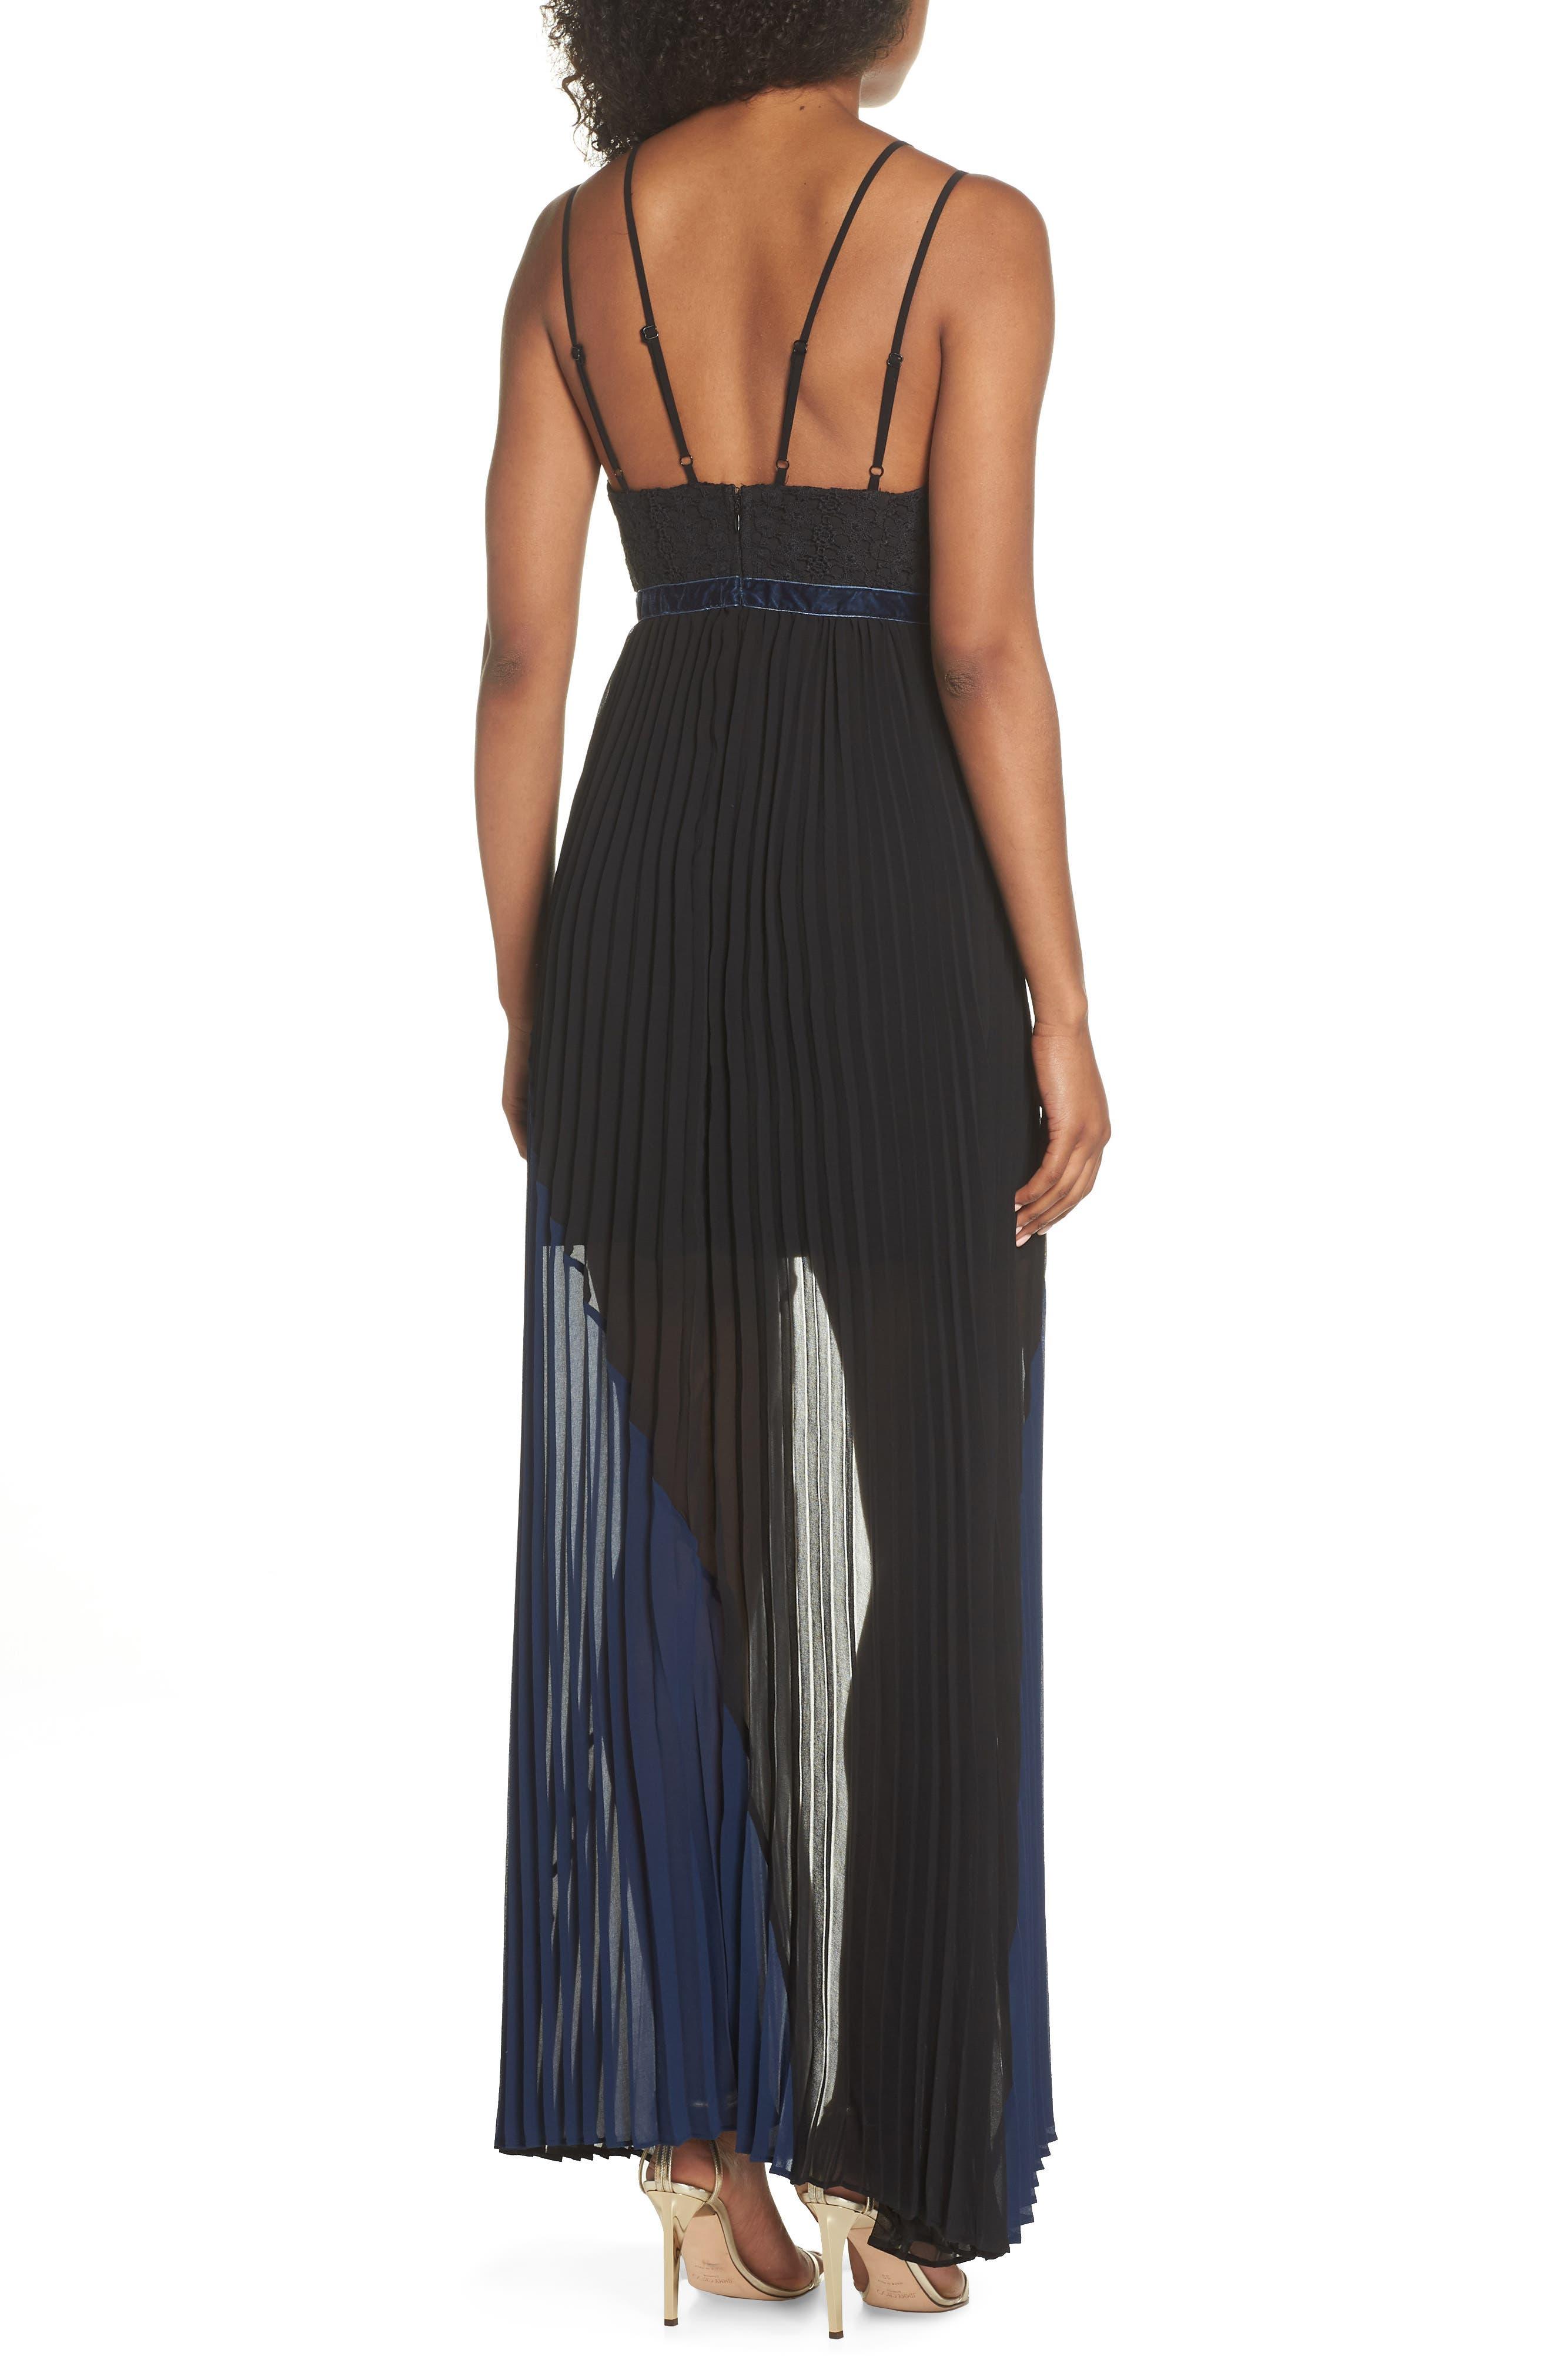 Nealea Pleat Chiffon Gown,                             Alternate thumbnail 3, color,                             Black/ Navy